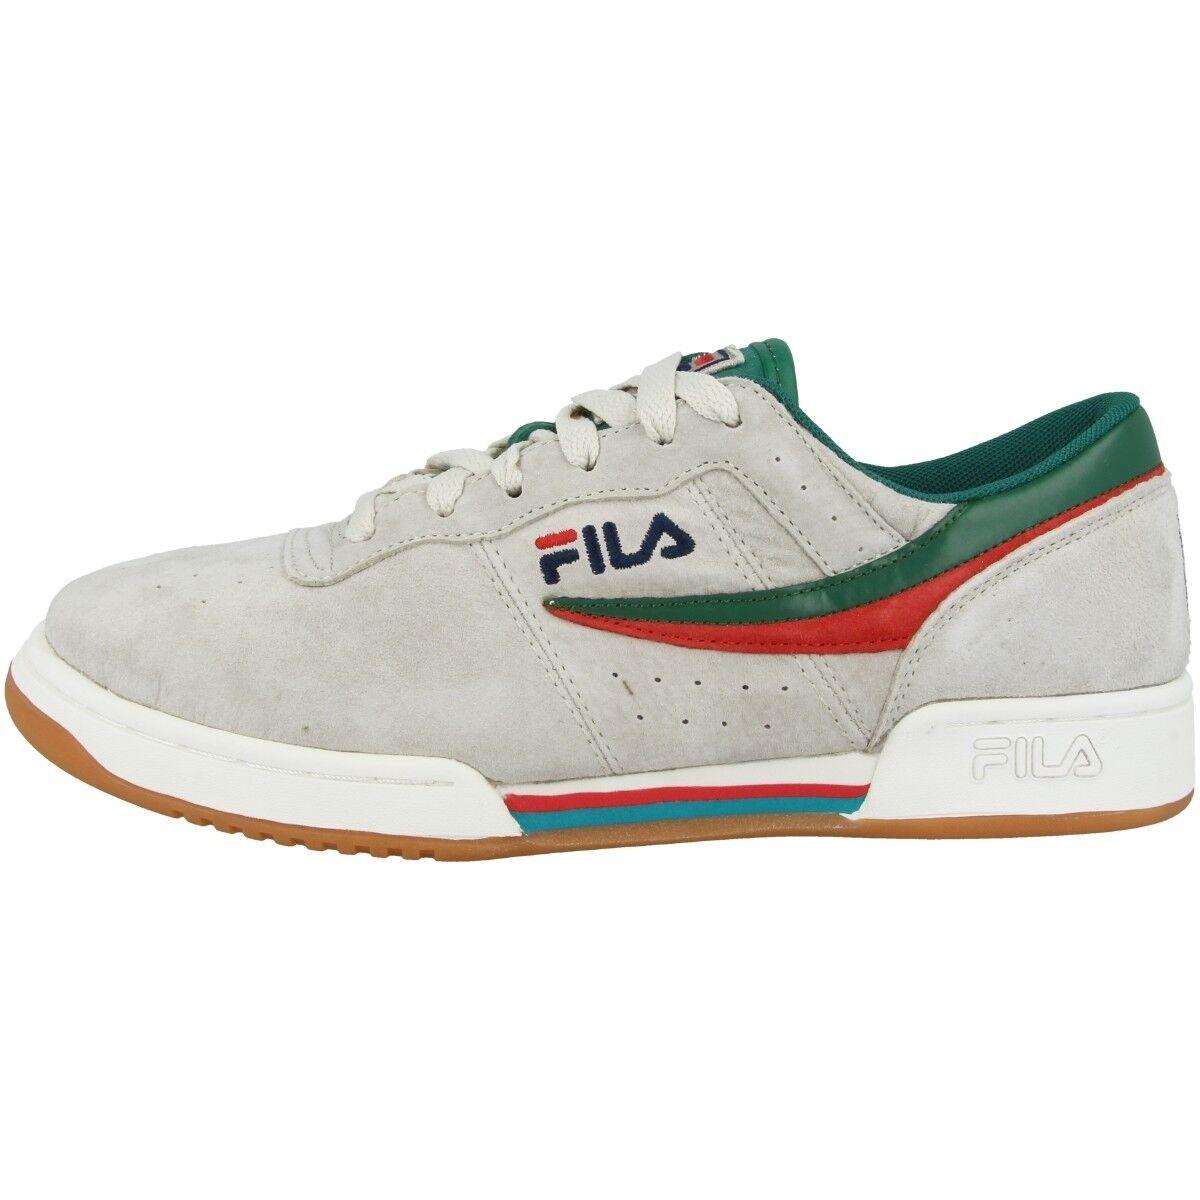 Fila Original Fitness S Chaussures Messieurs Low Cut Basket Turtledove 1010259.00r